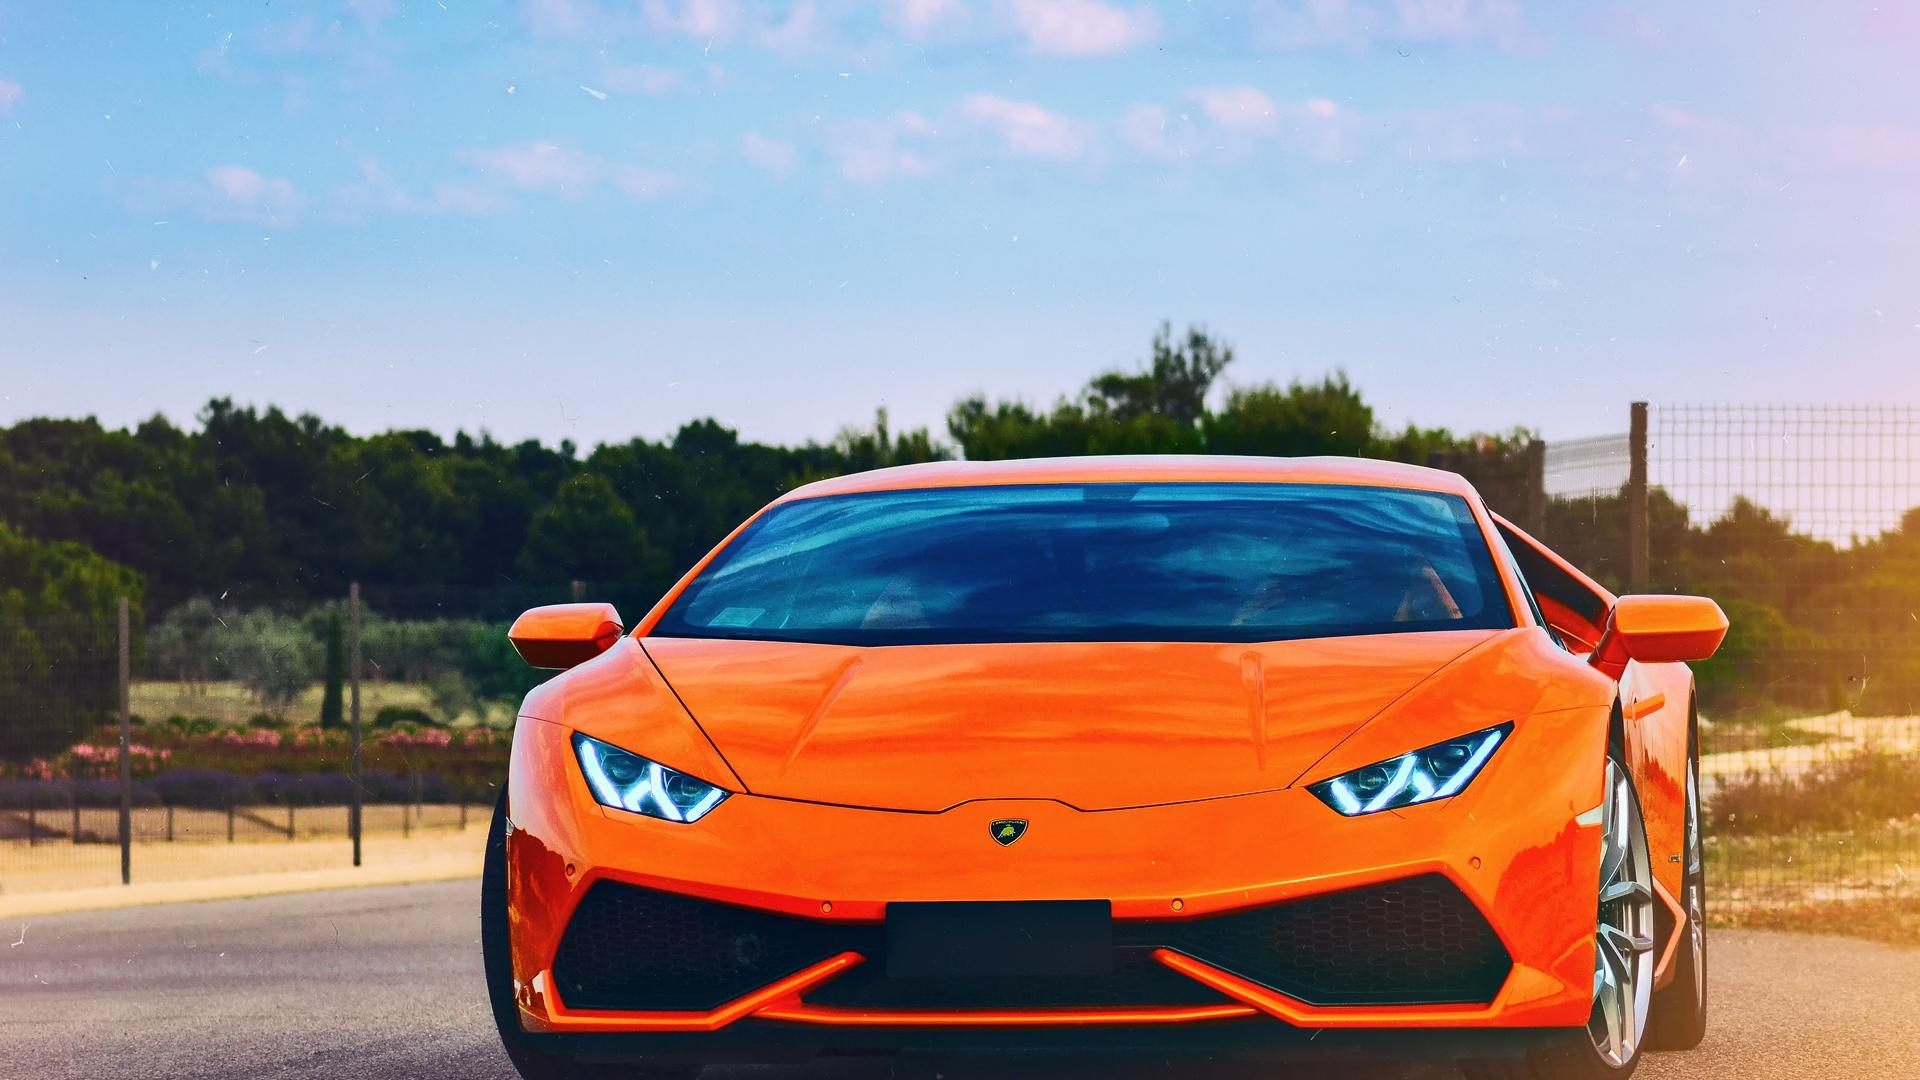 Lamborghini Huracan Desktop Wallpaper